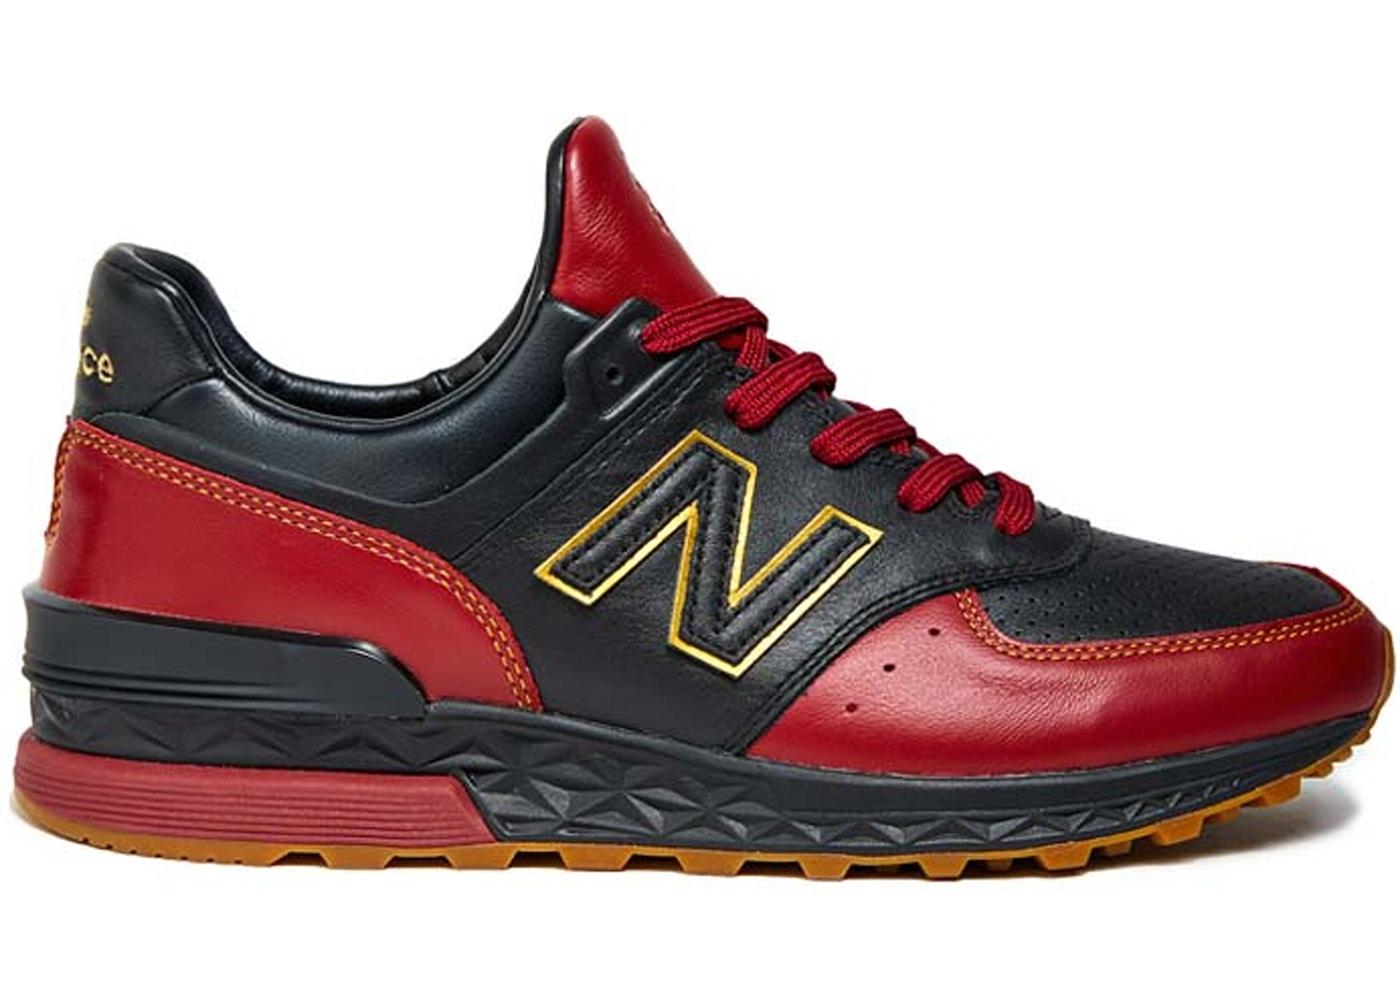 New Balance 574 Sport Limited Edt Vault